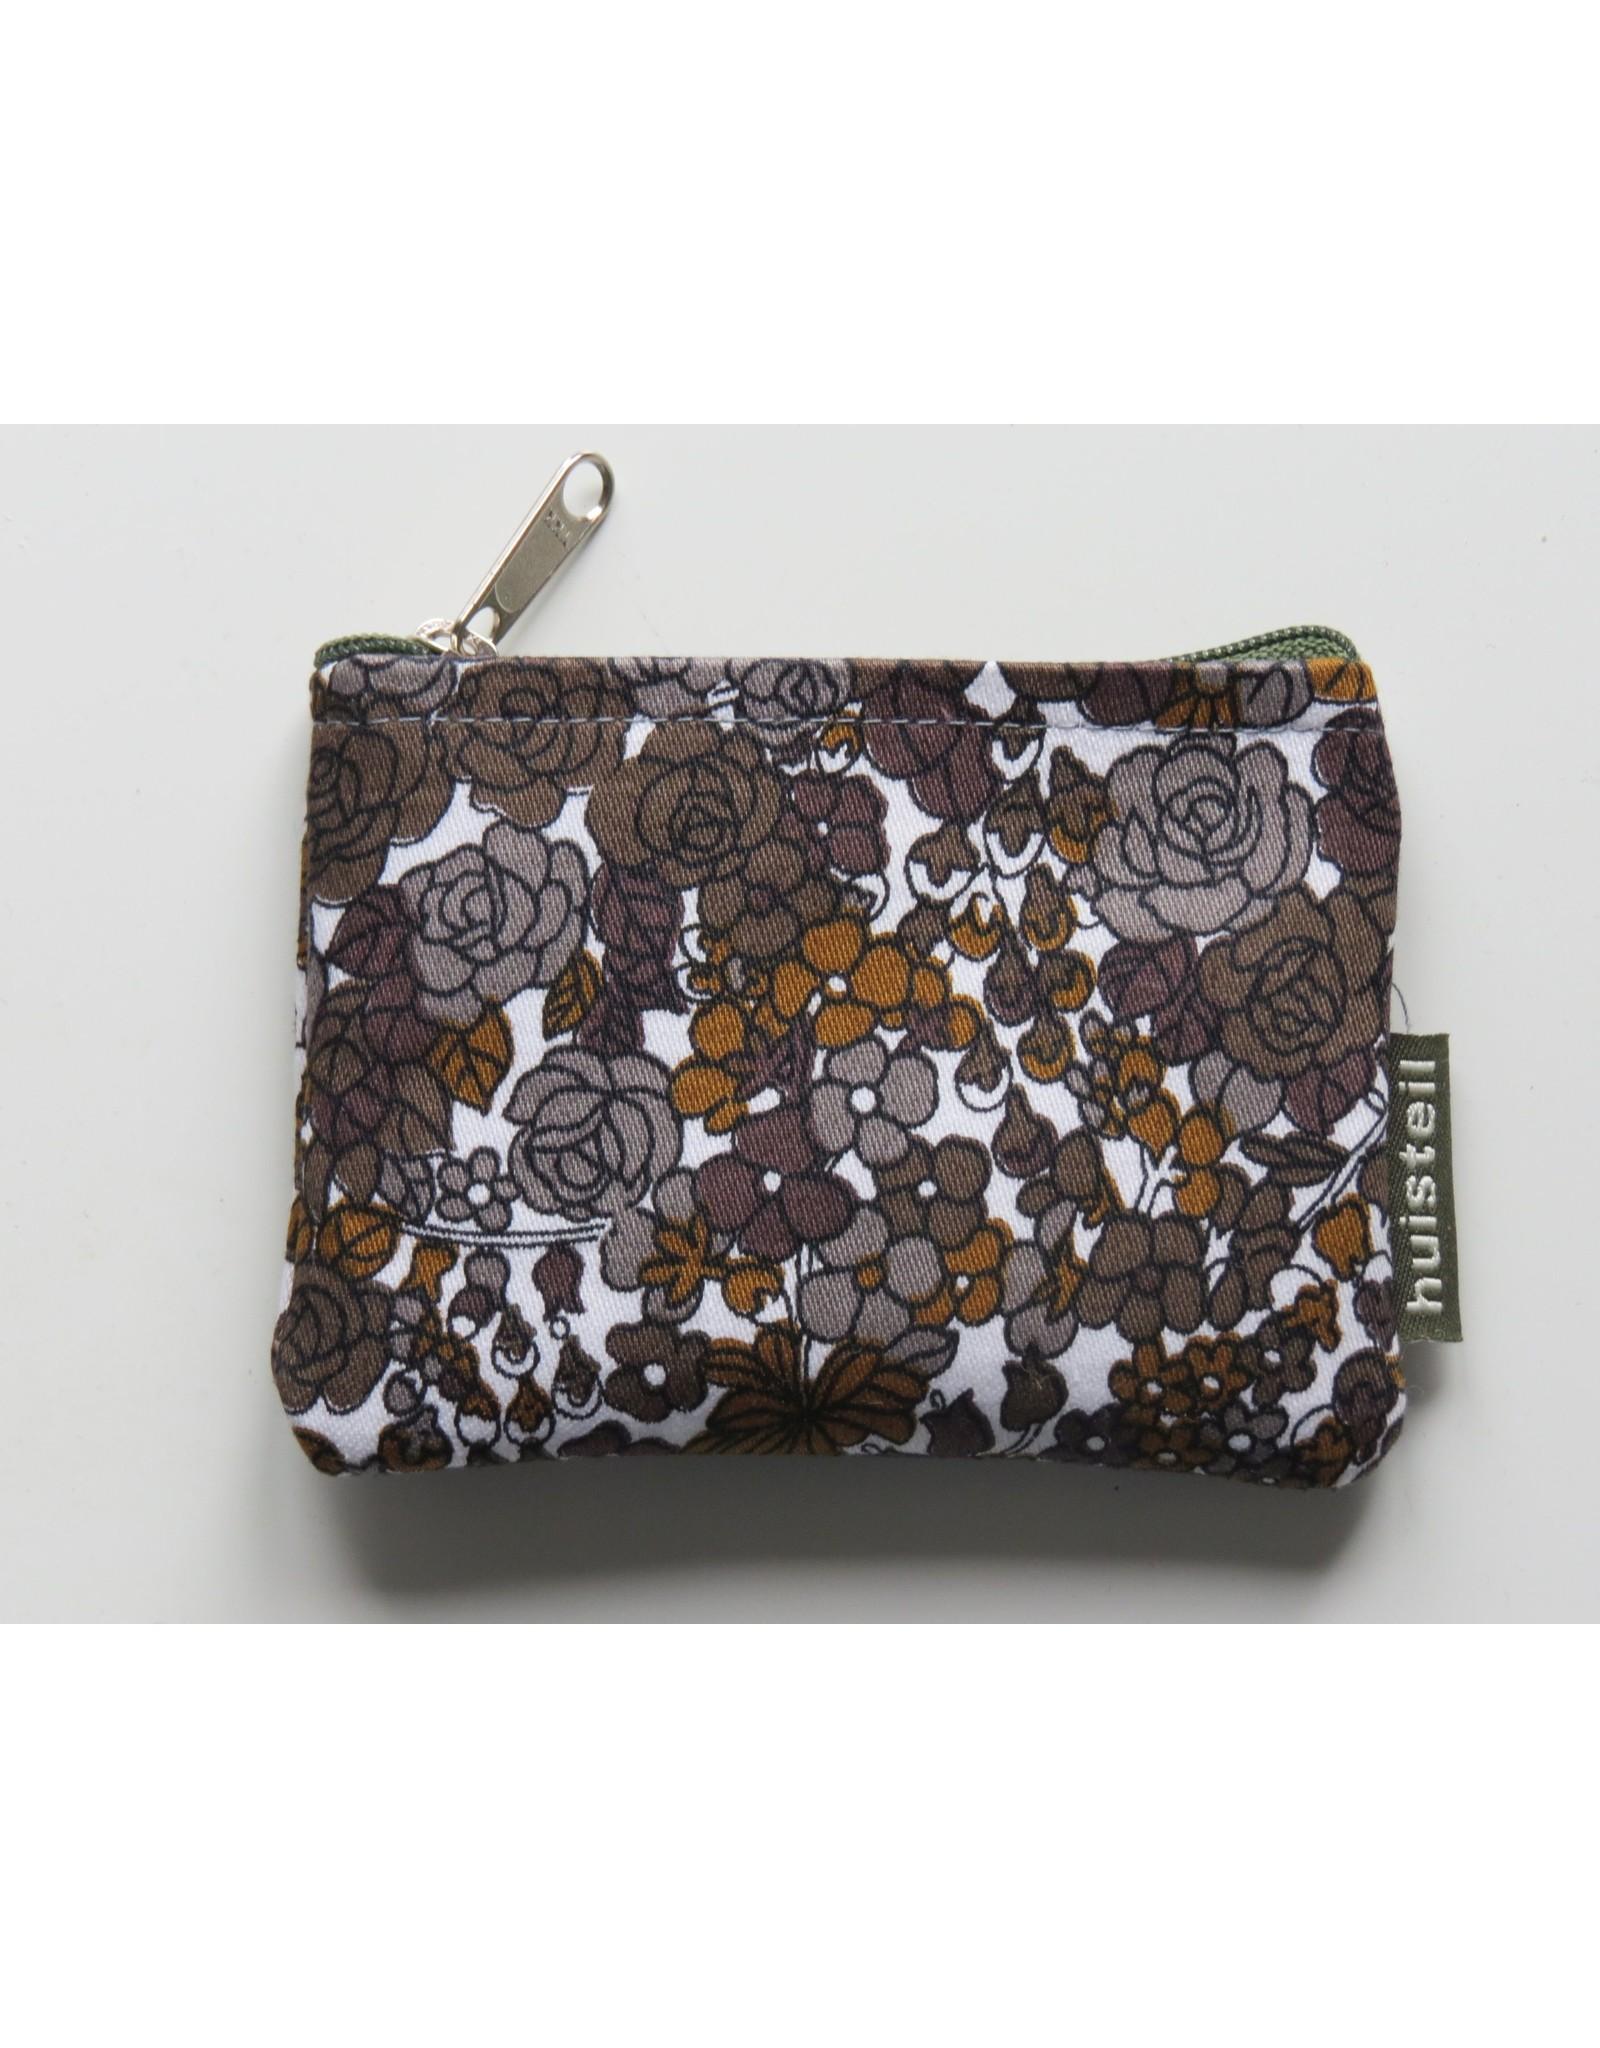 Huisteil Small vintage purse - stylish